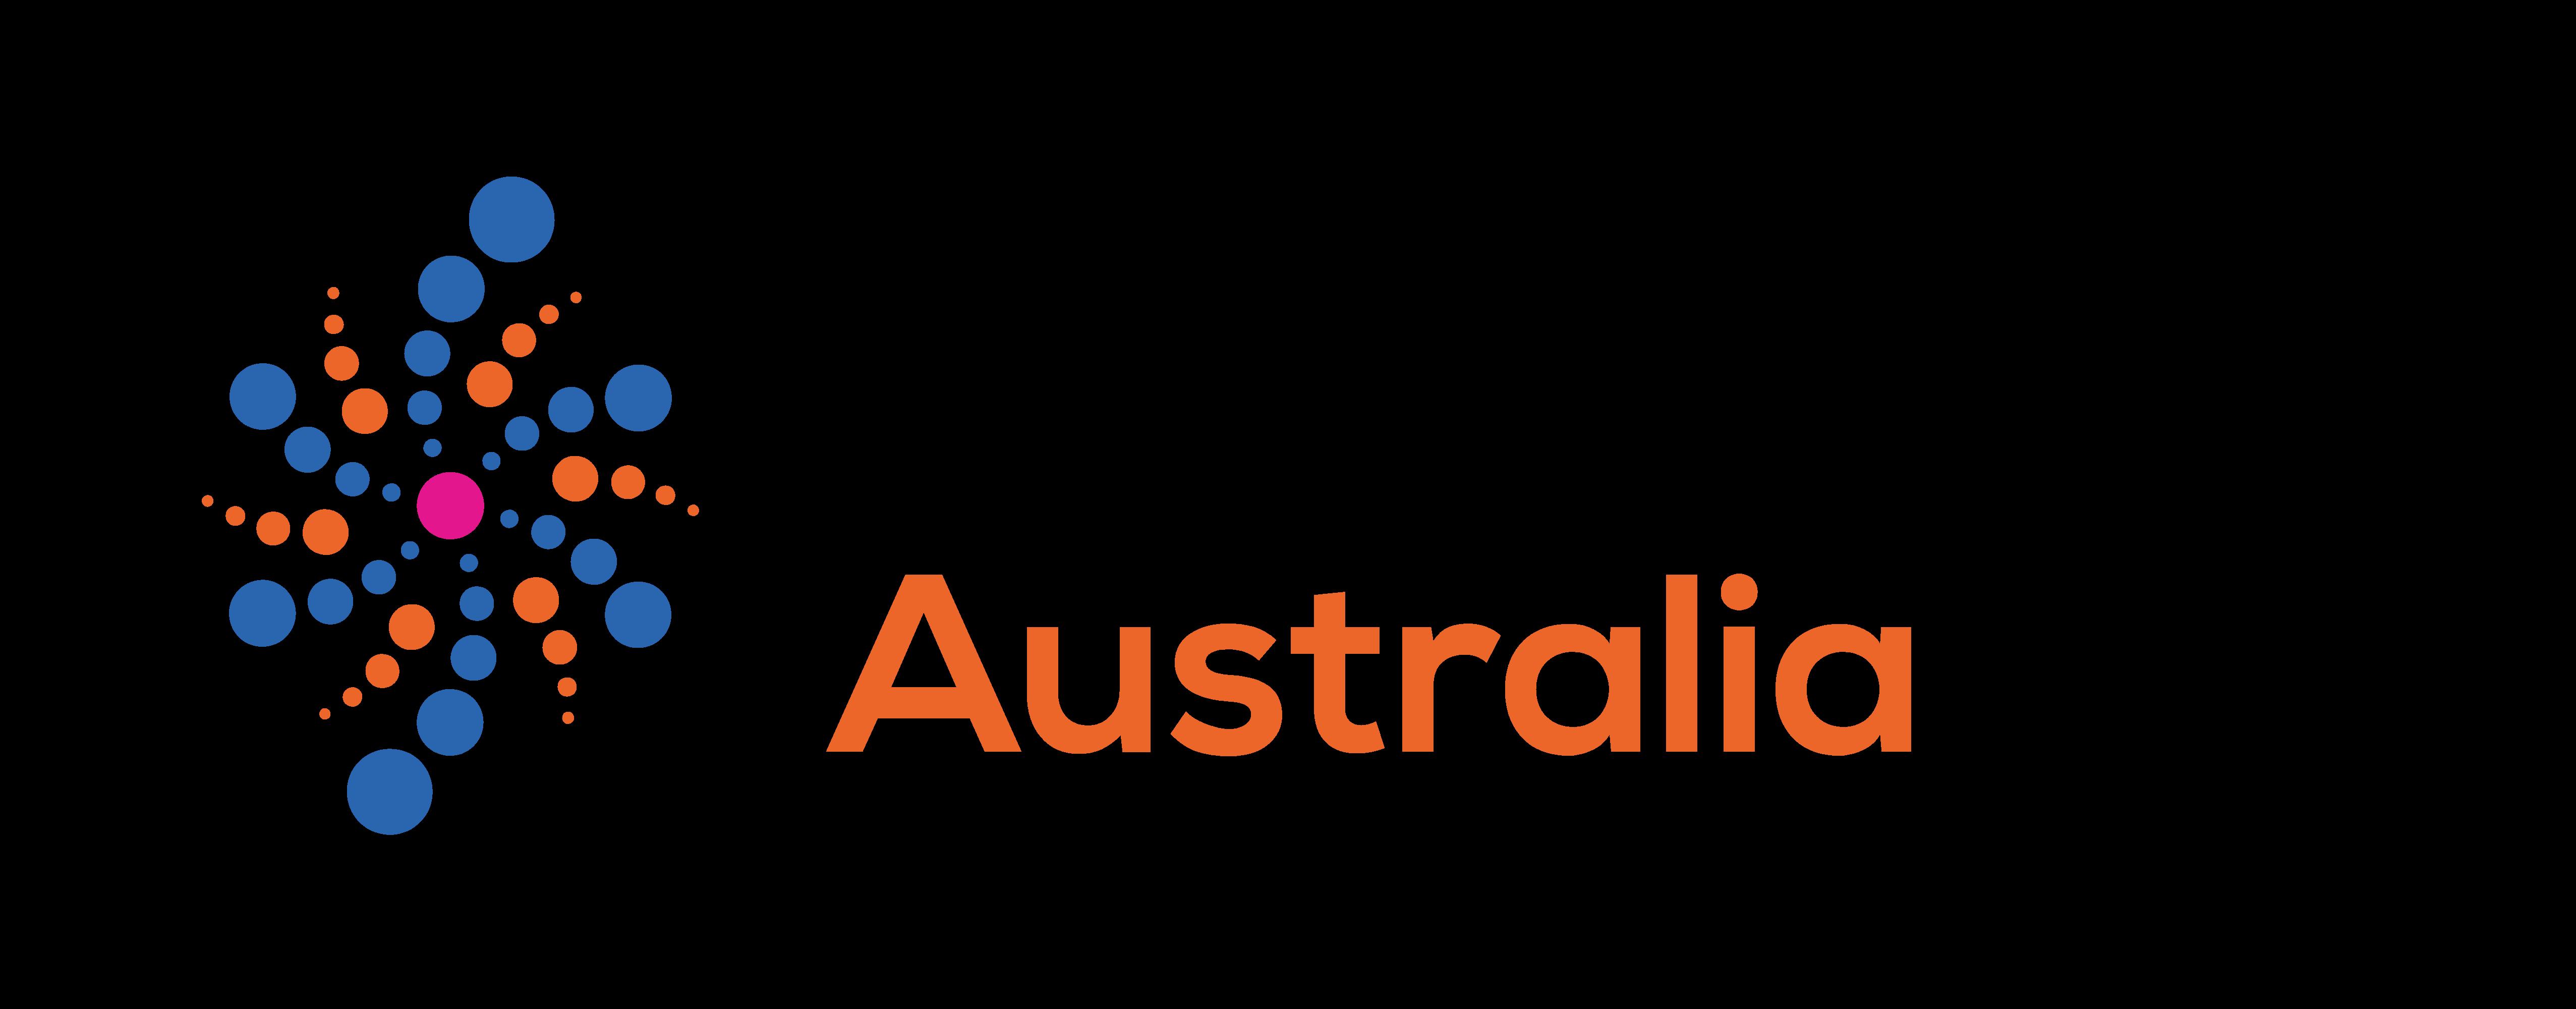 Singularity_U_Australia_None_transparent_2_lines_xxl